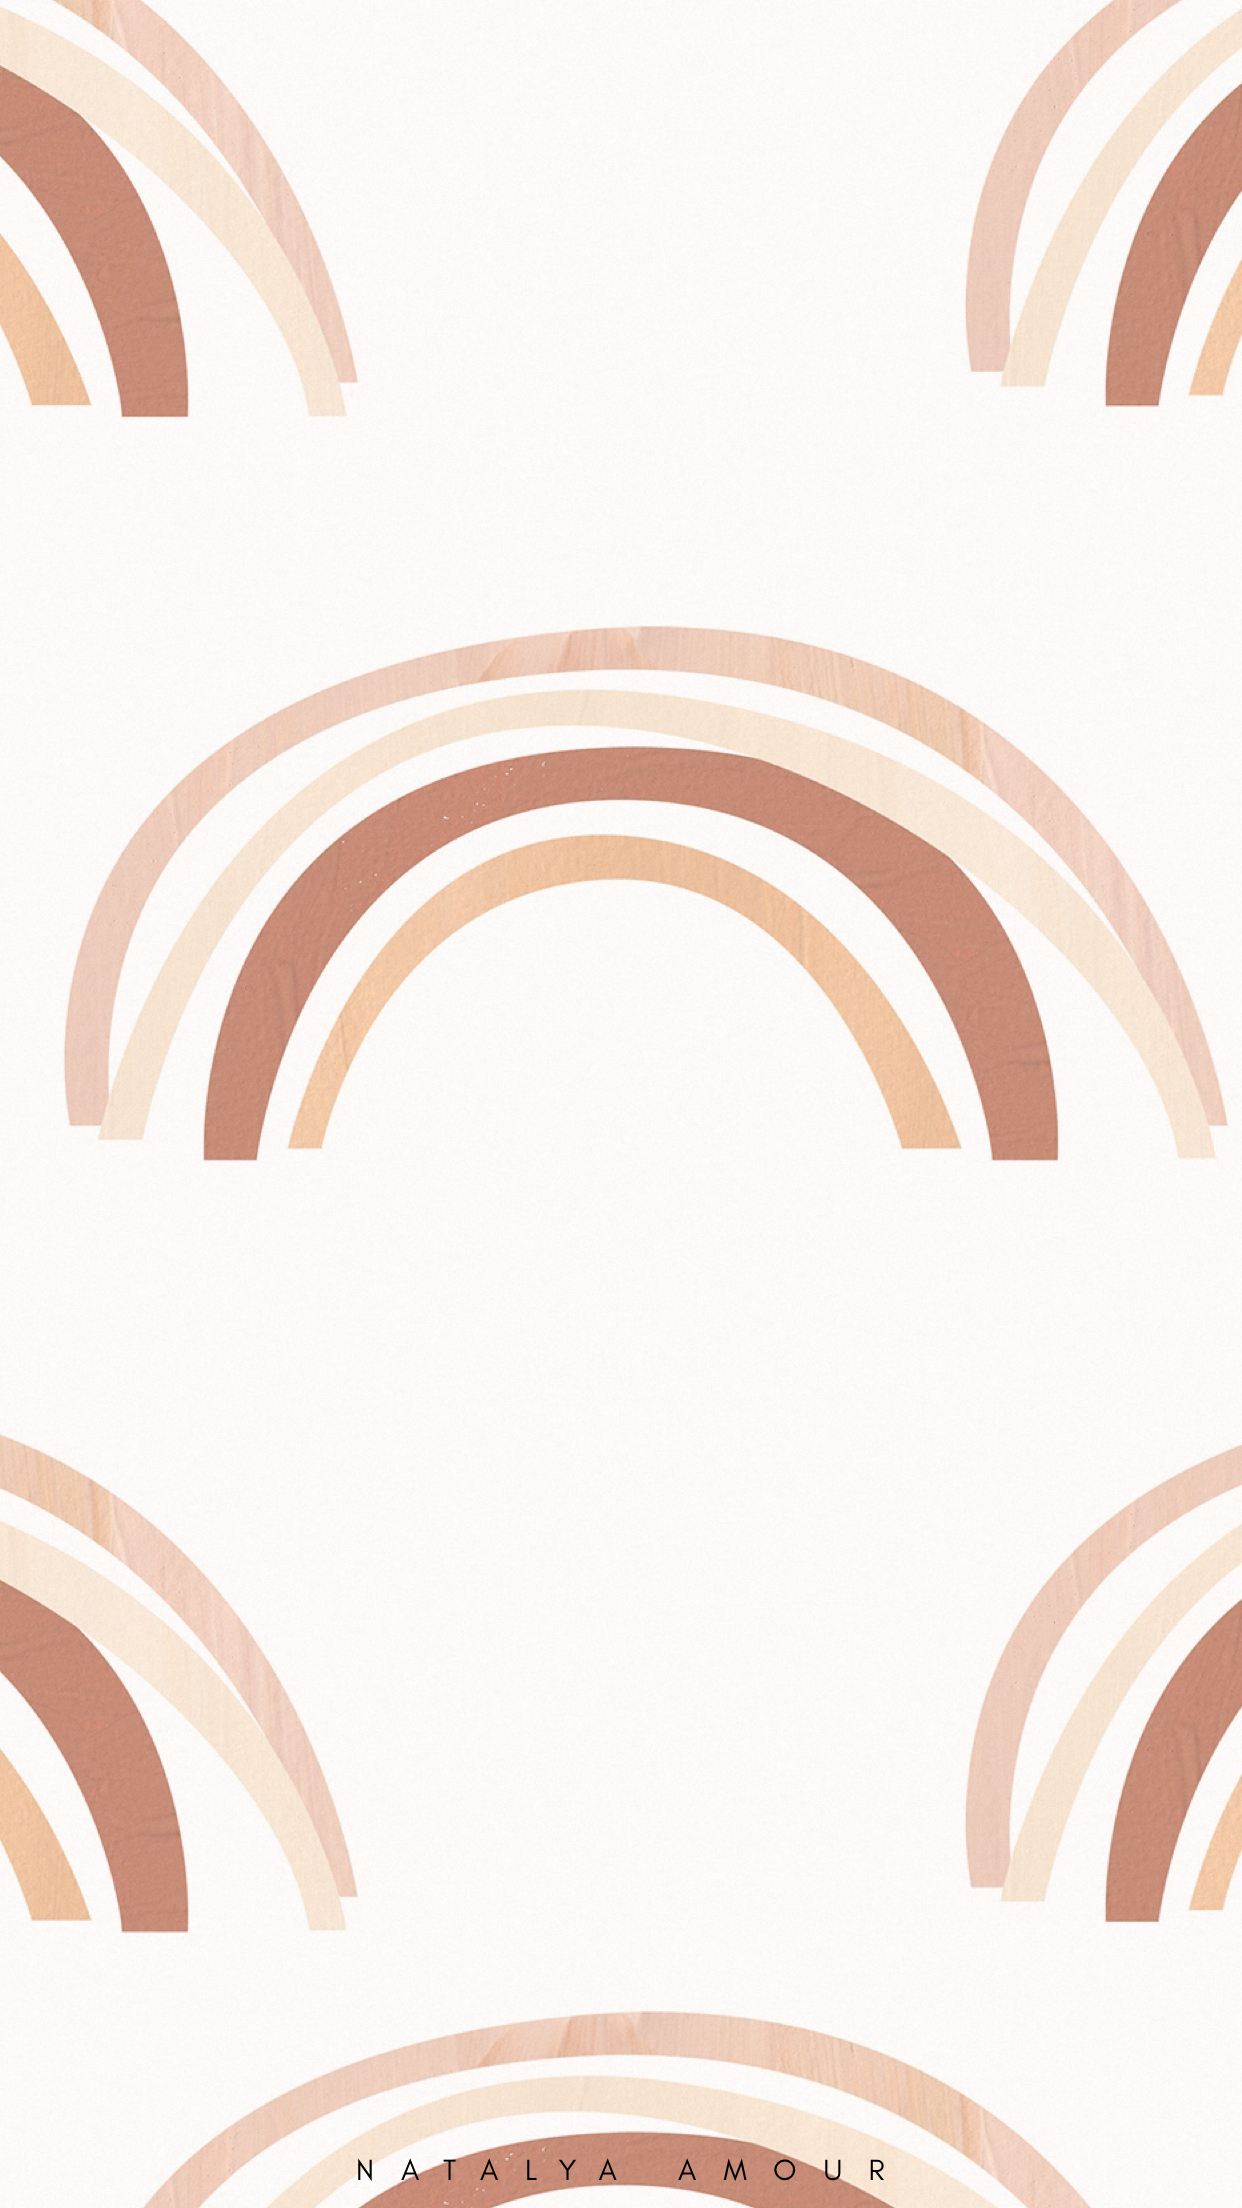 New Blog Post on natalyaamourcom January Desktop Wallpaper 1242x2208